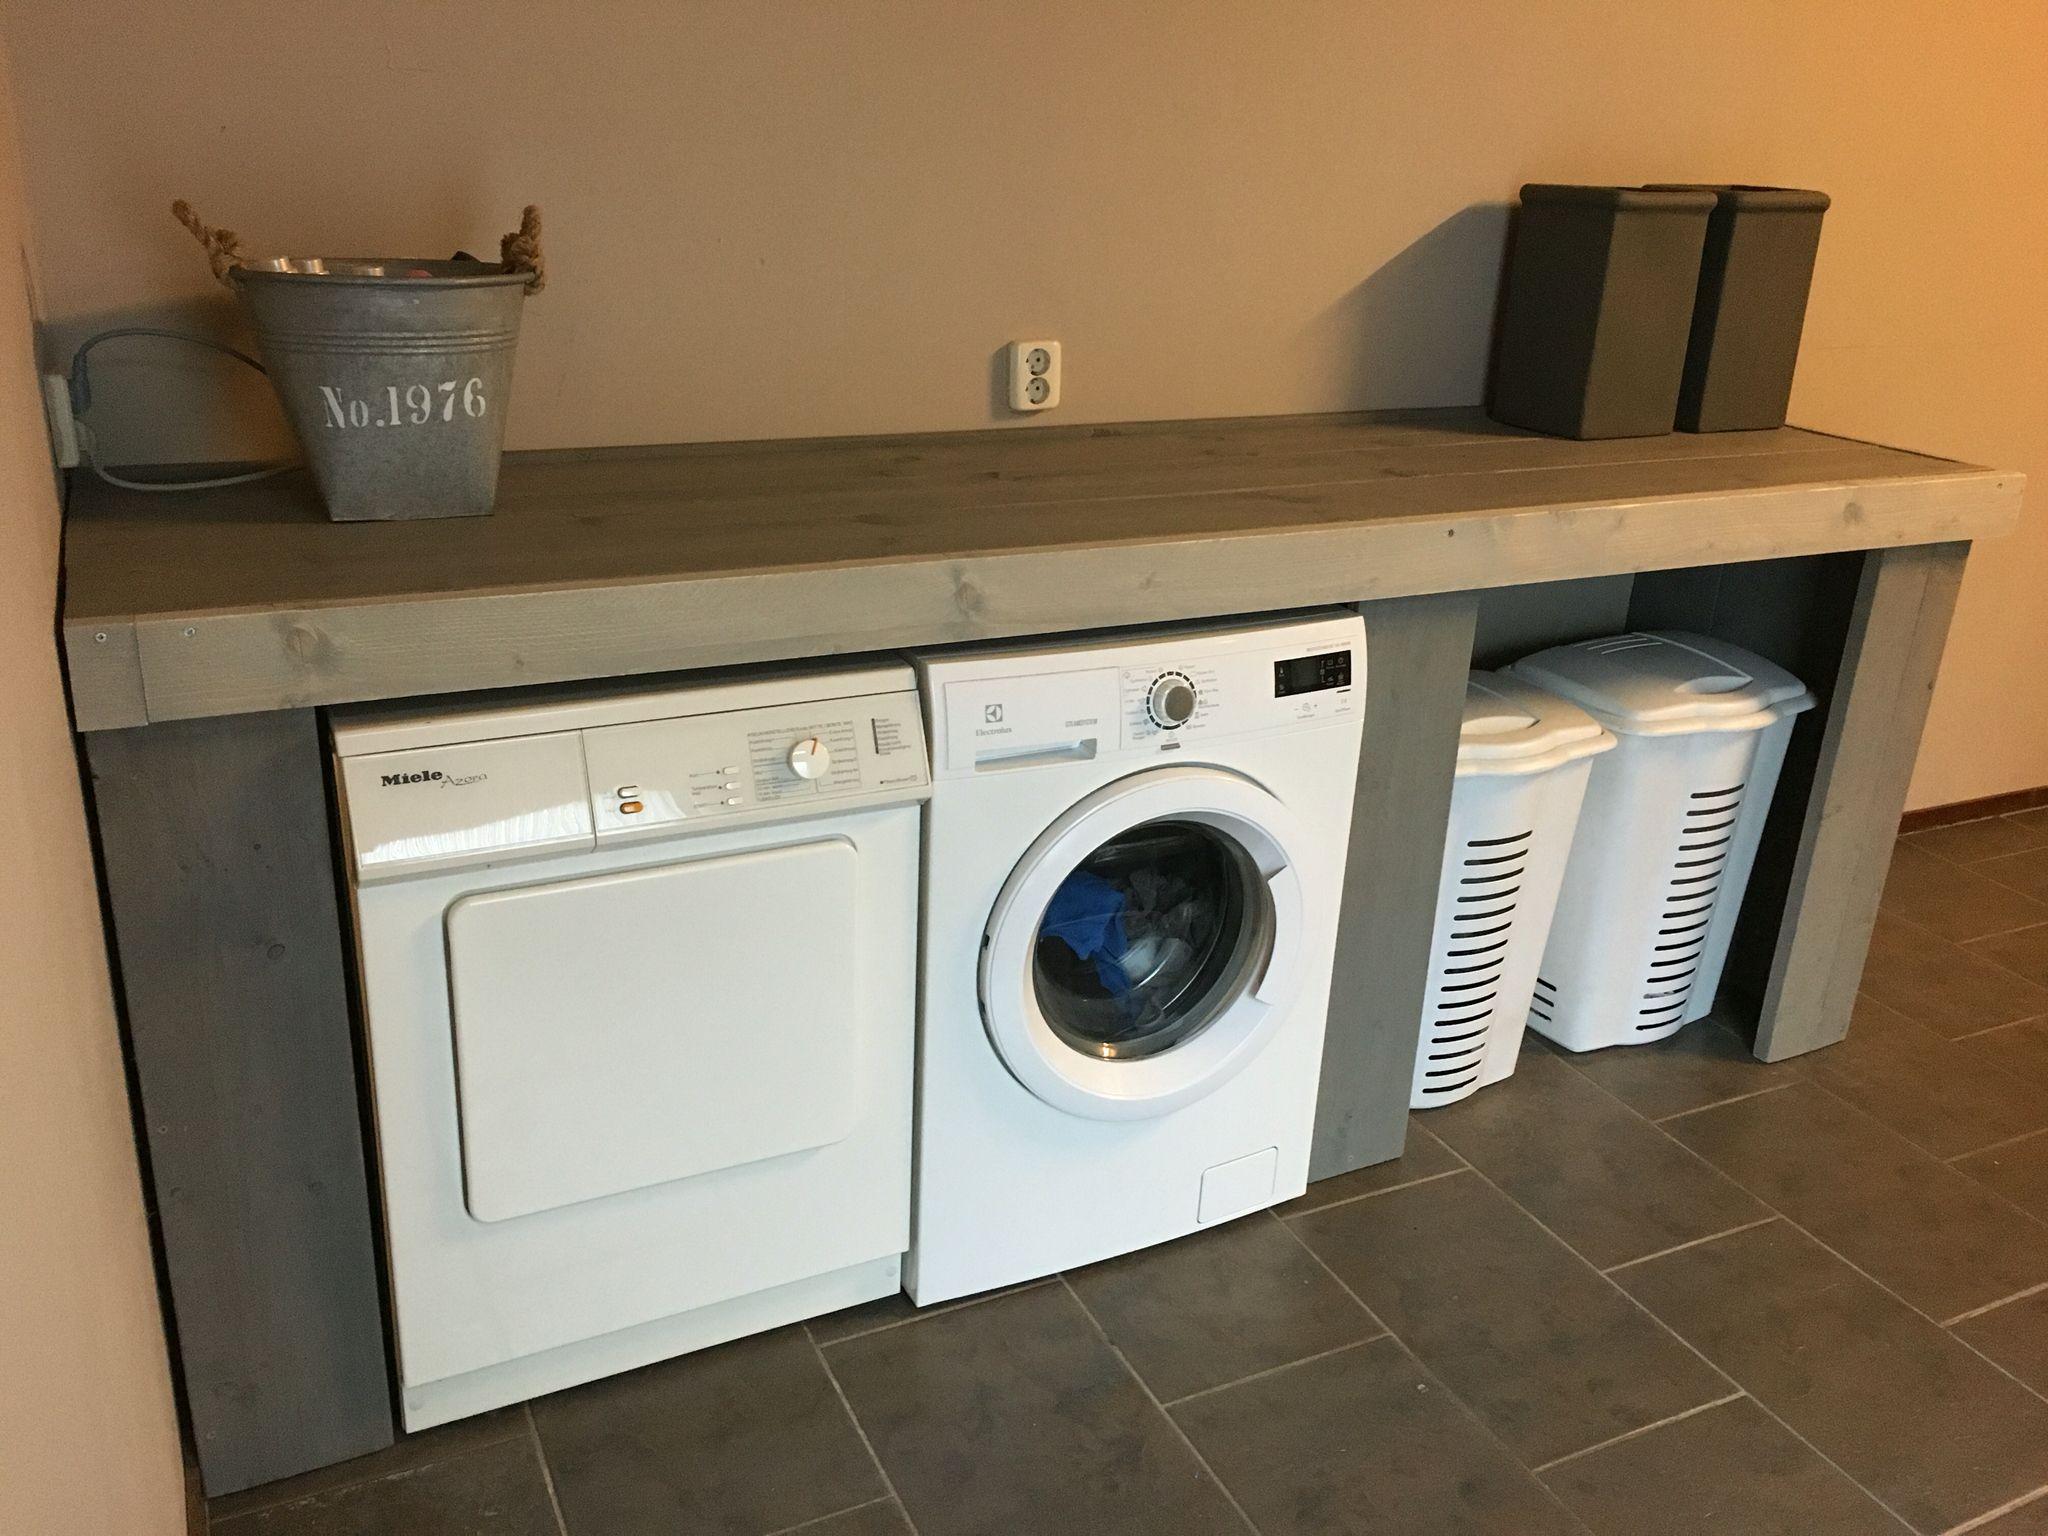 Wasmachine Kast Badkamer : Wasmachine ombouw @simone van zandvoort kleine keuken pinterest